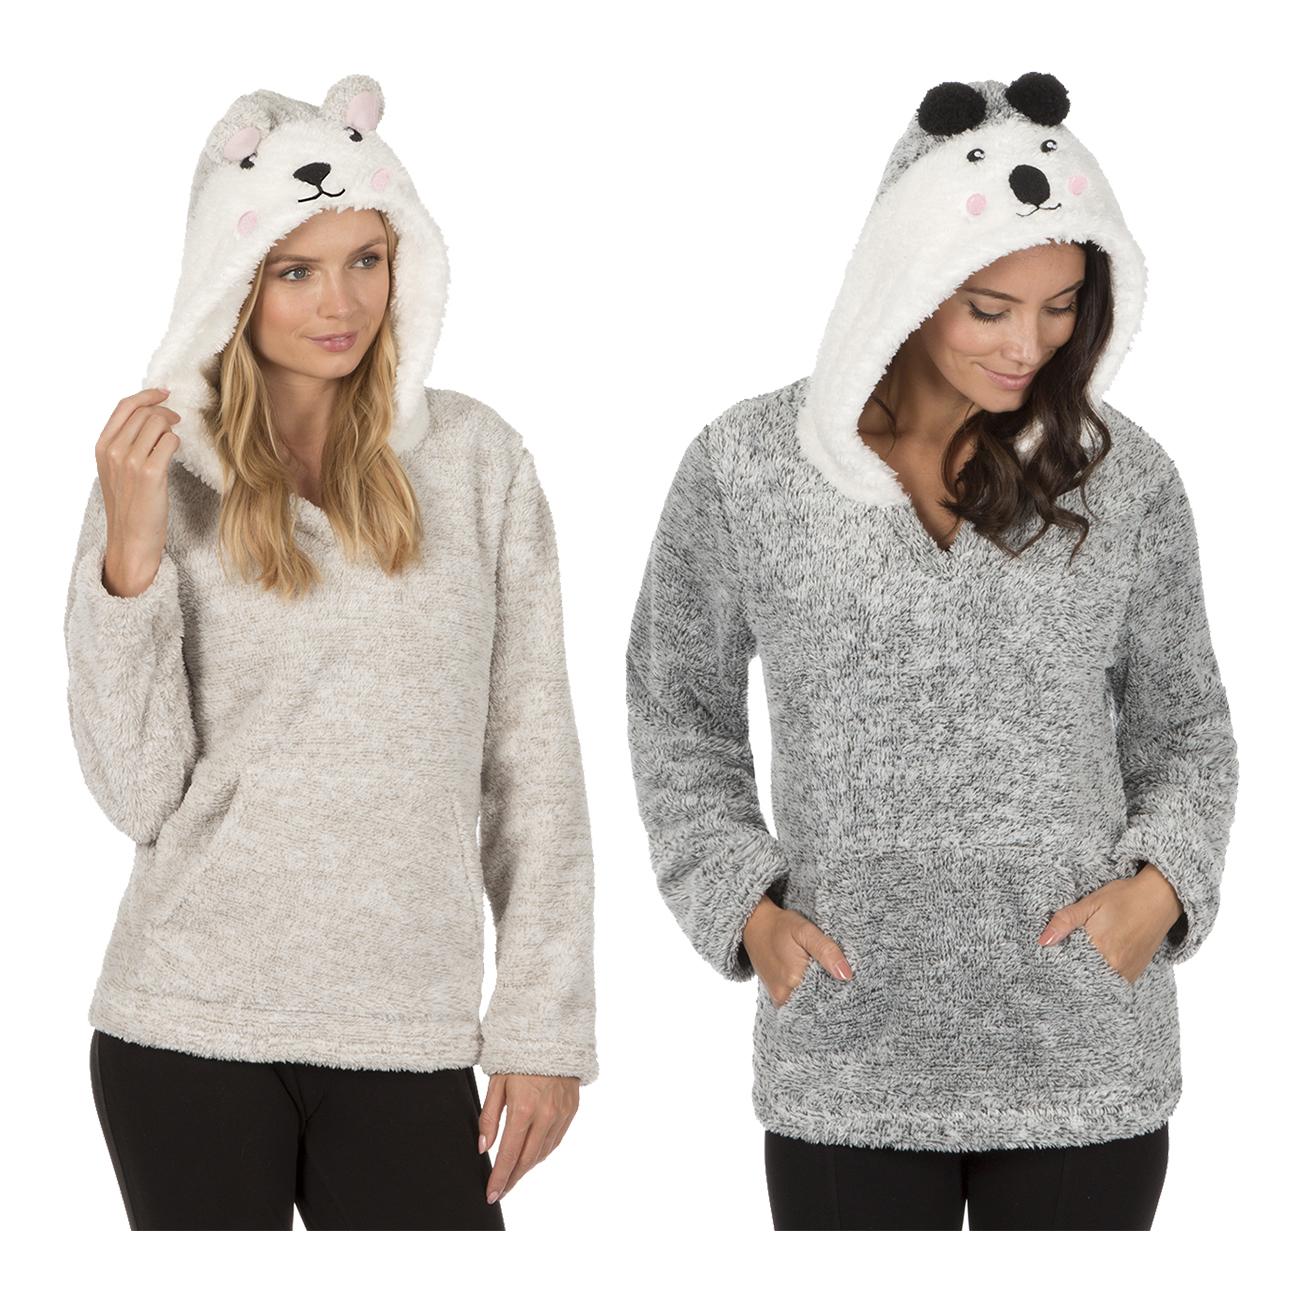 Ladies Women Animal Novelty Hooded Two Tone Snuggle Fleece Lounge Top Nightwear